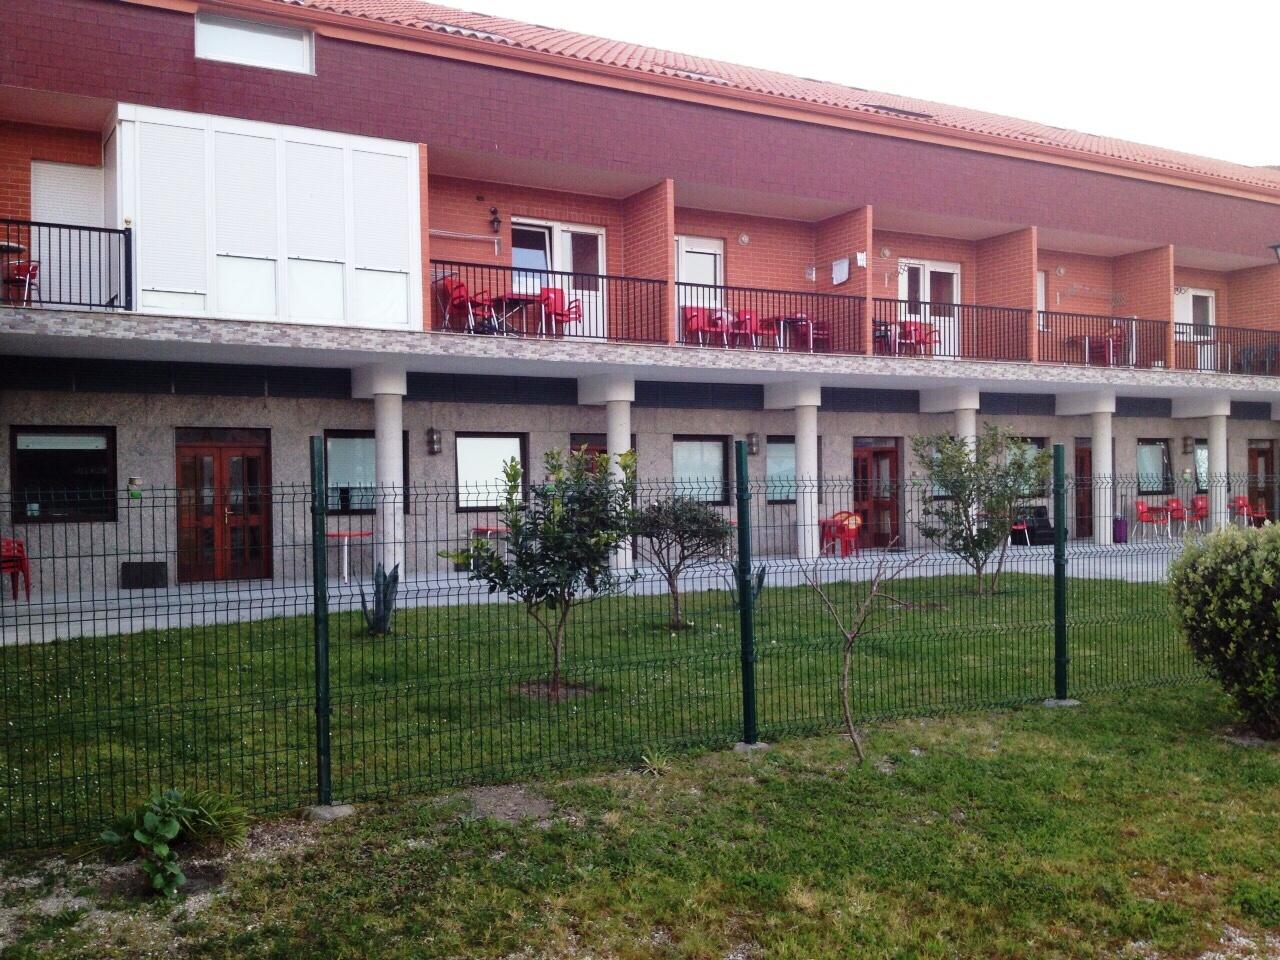 Hotel Restaurante Merendero